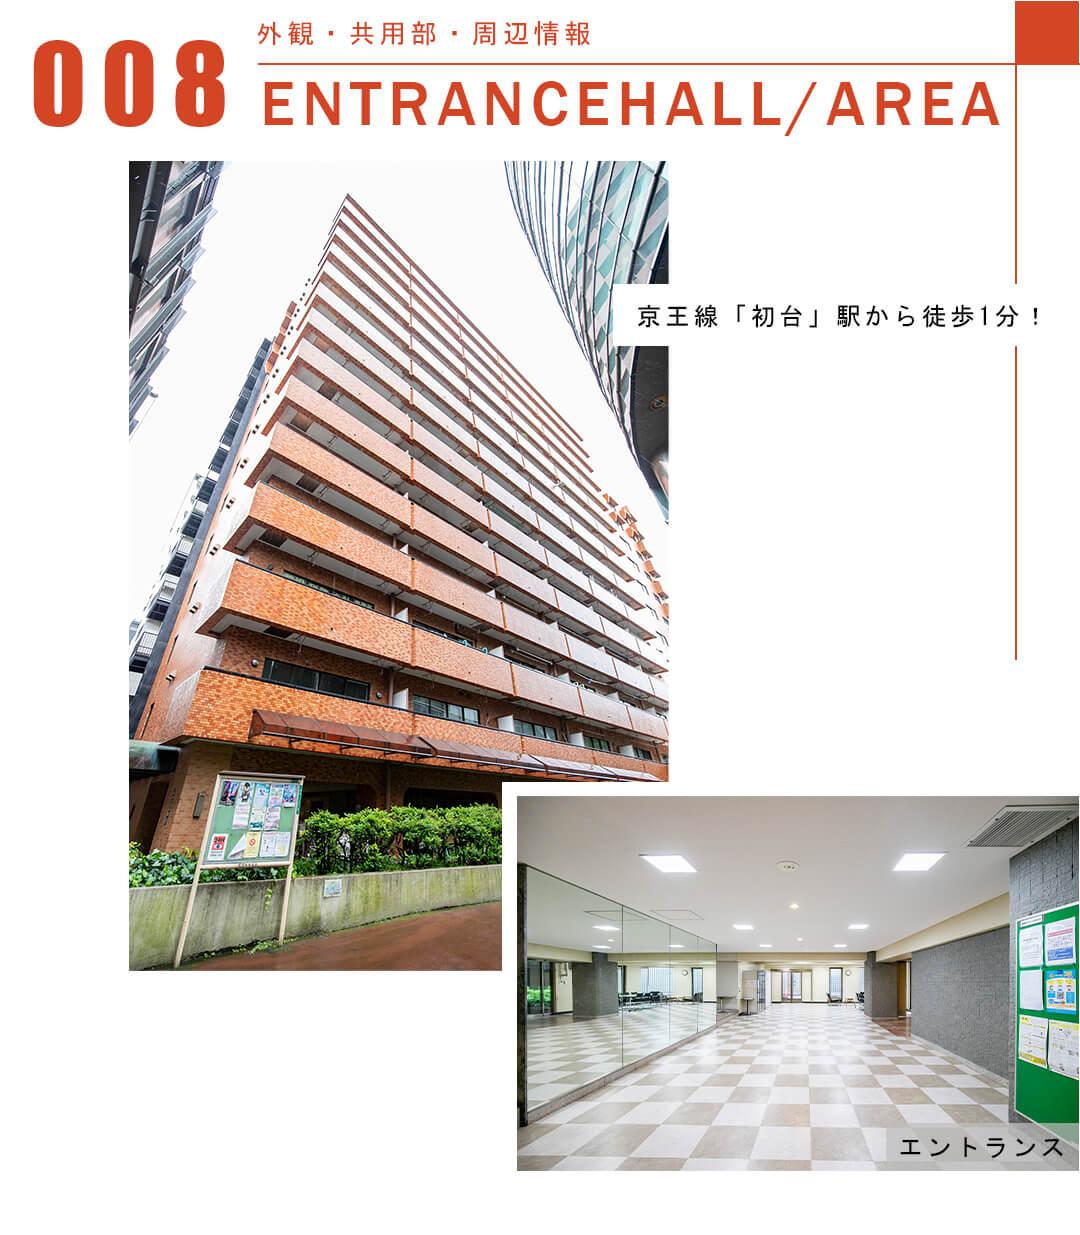 008外観,共用部,周辺情報,ENTRANCEHALL,AREA